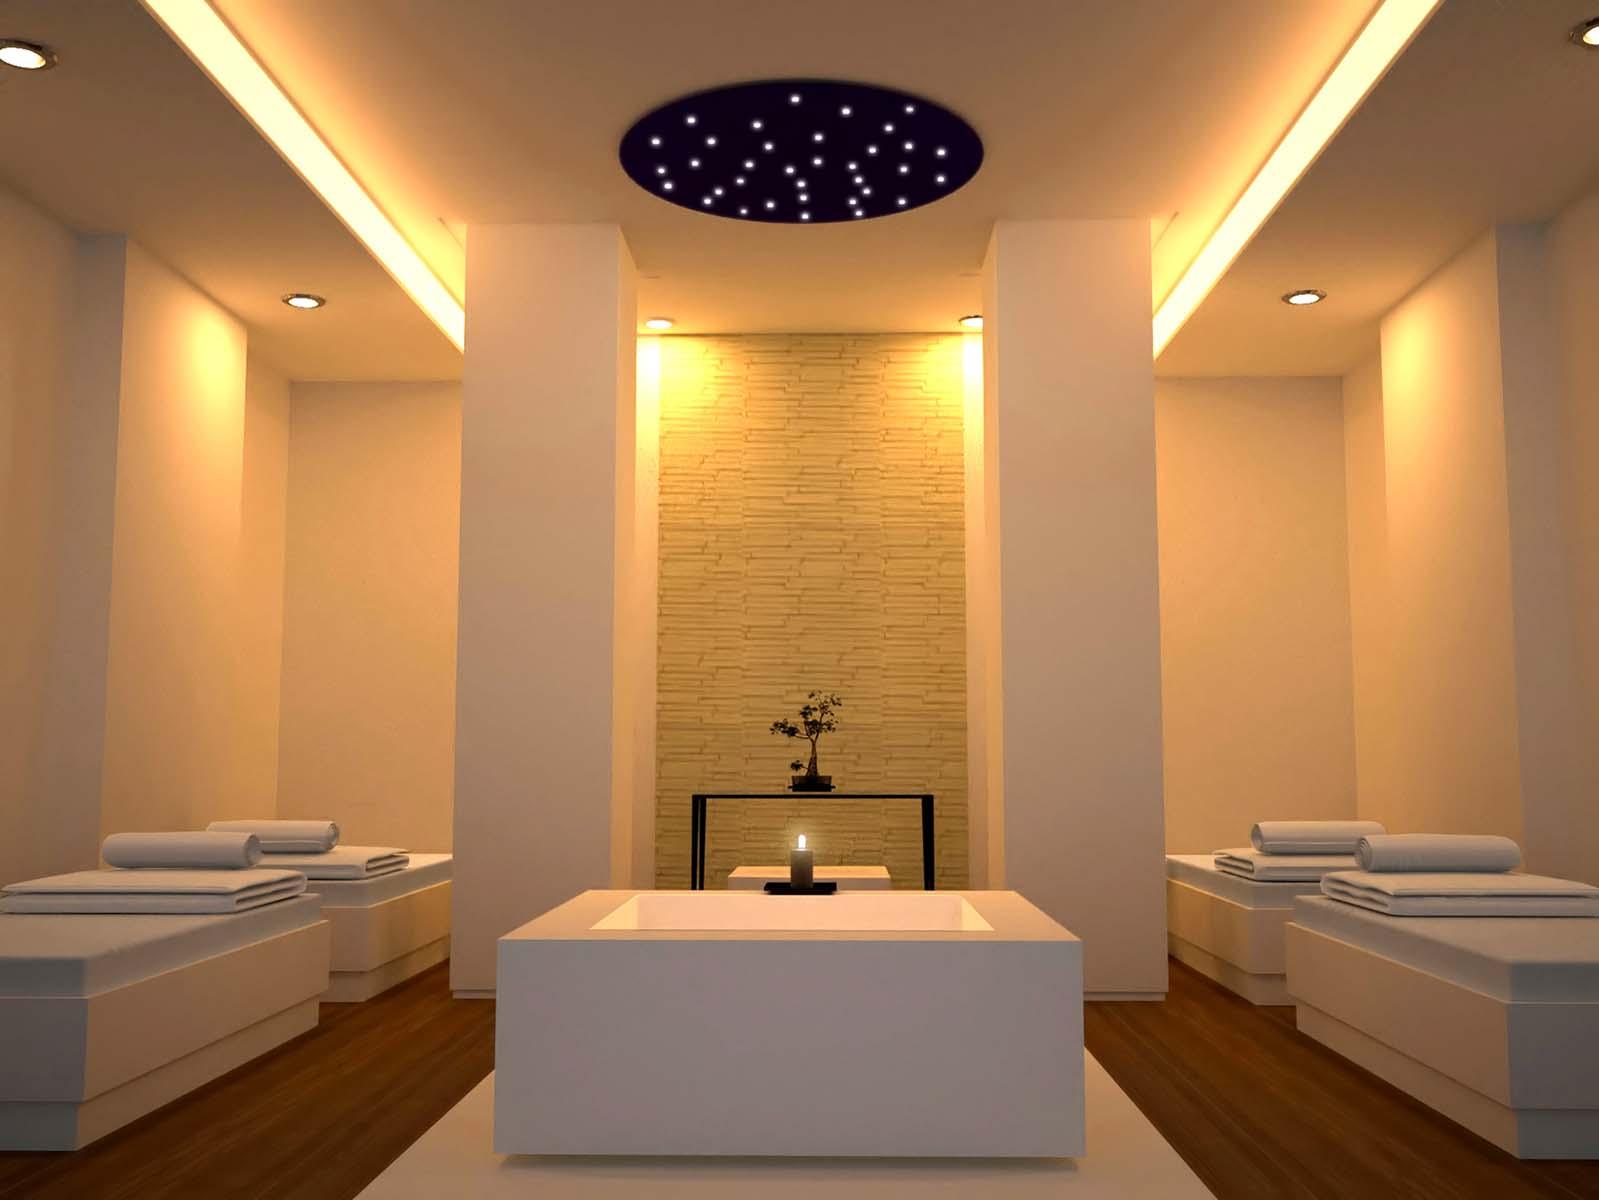 Spa Light Fixture